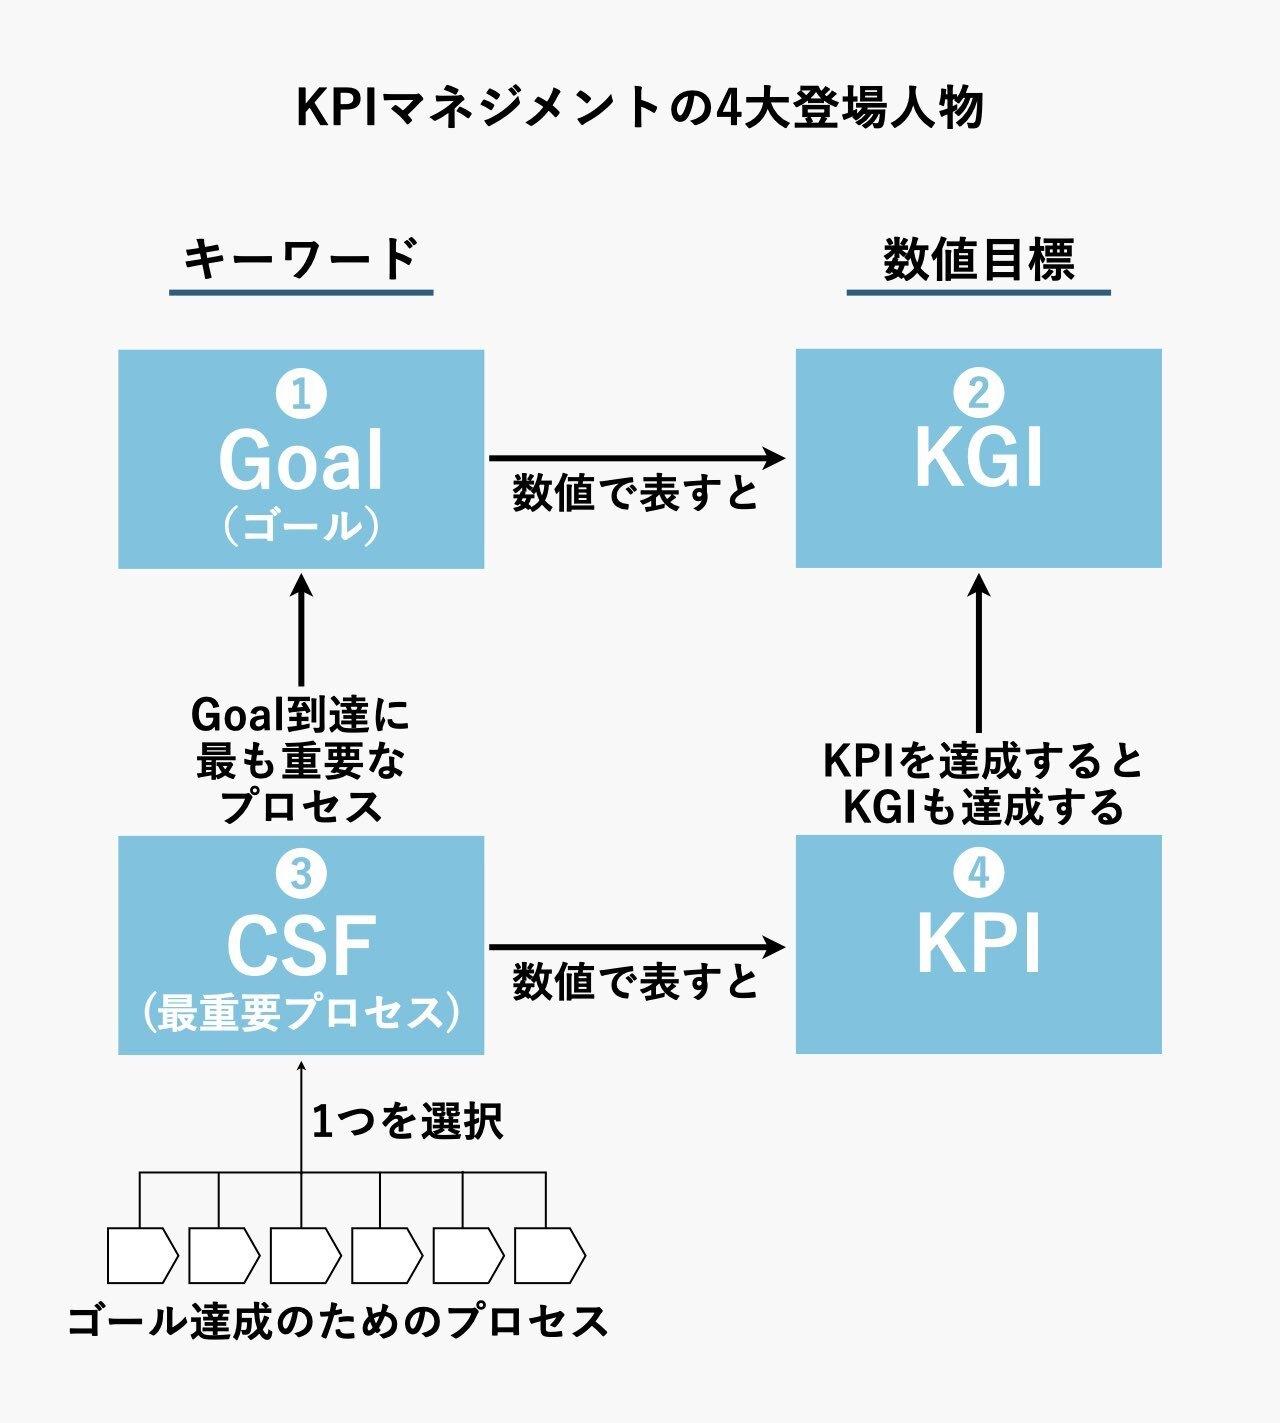 KPIマネジメントの4大登場人物